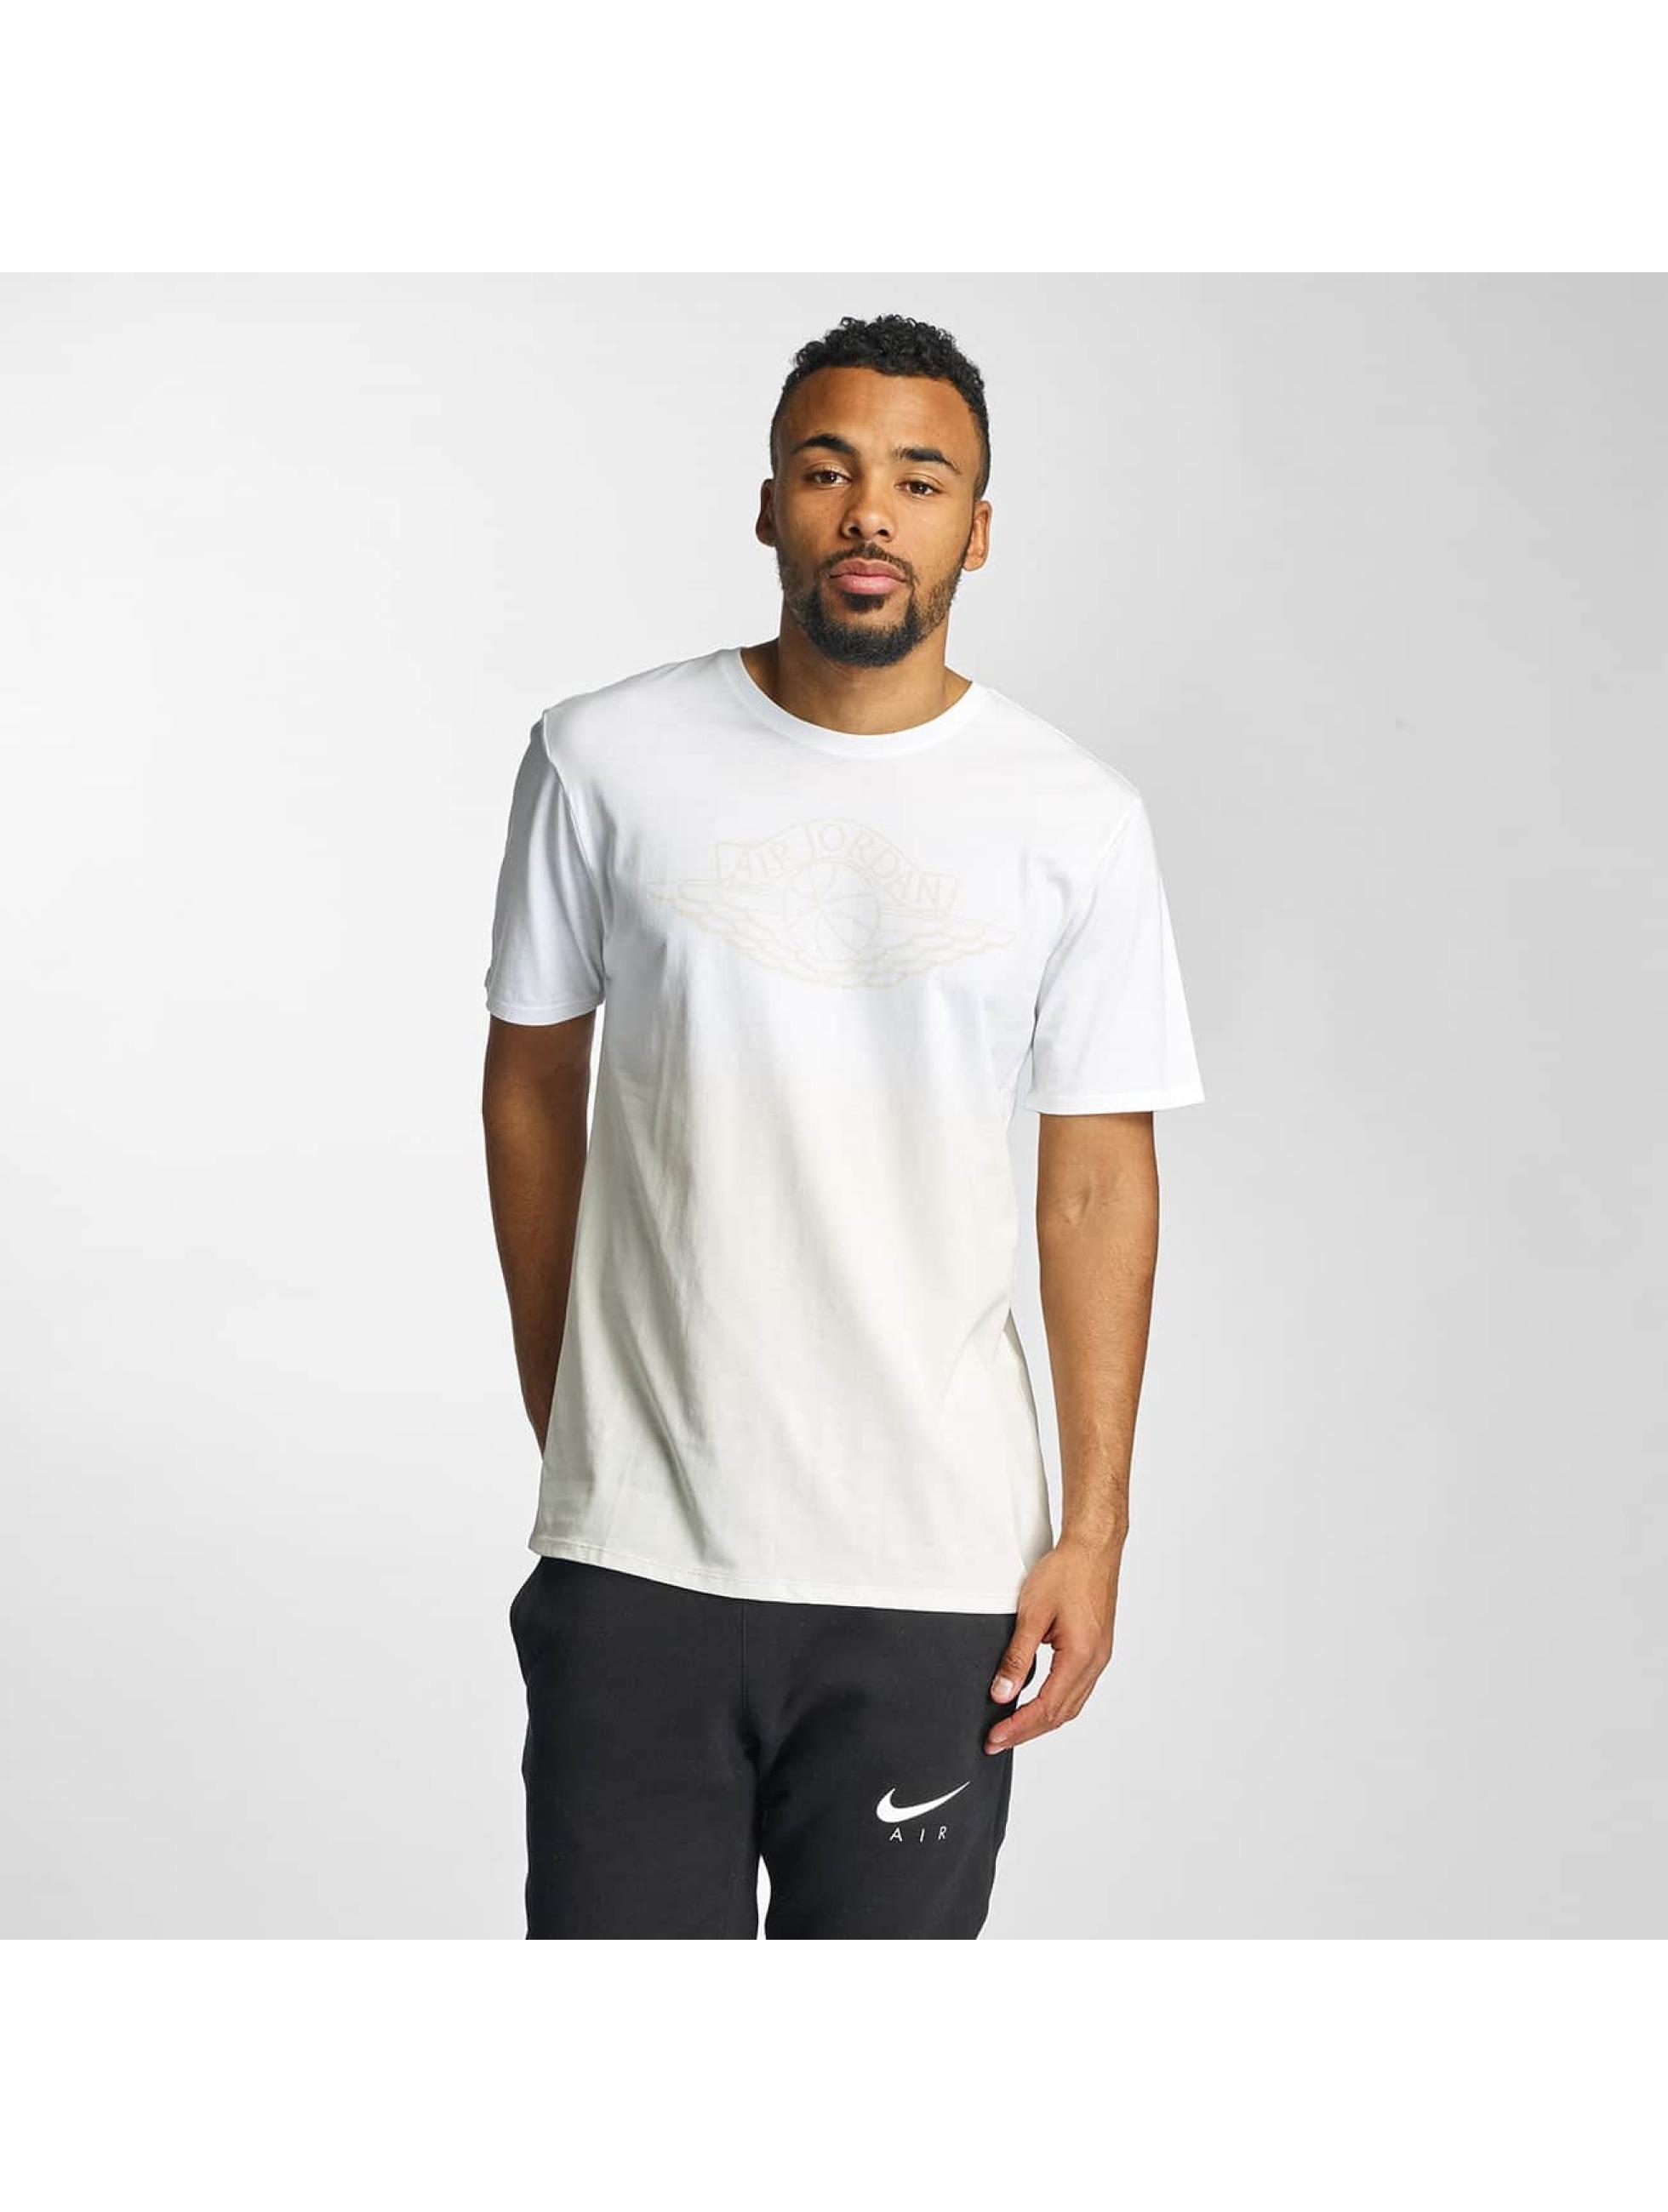 Jordan Männer T-Shirt Fadeaway Faded in weiß